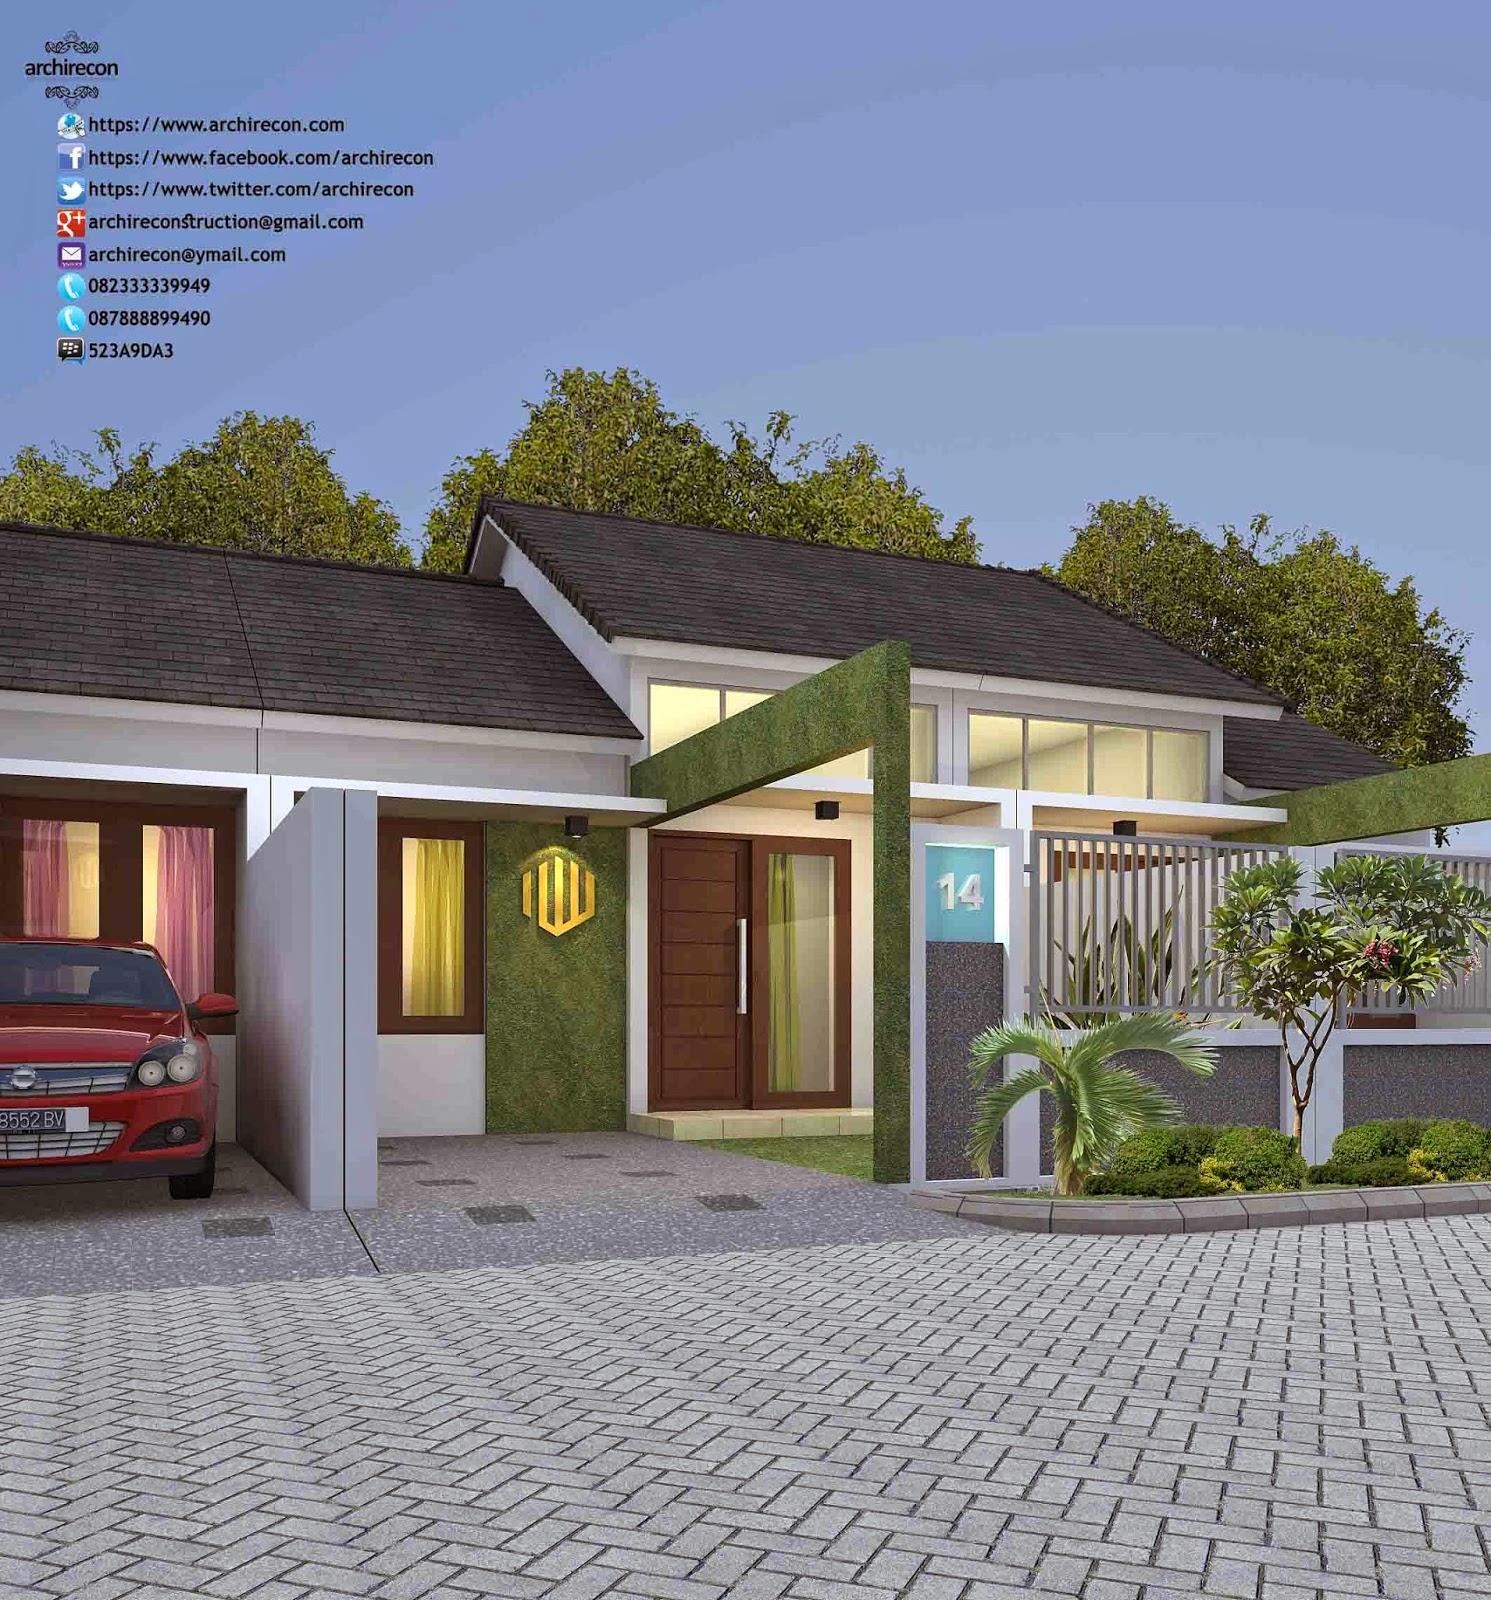 Desain Rumah Minimalis Perumahan Samara Residence - Type 36